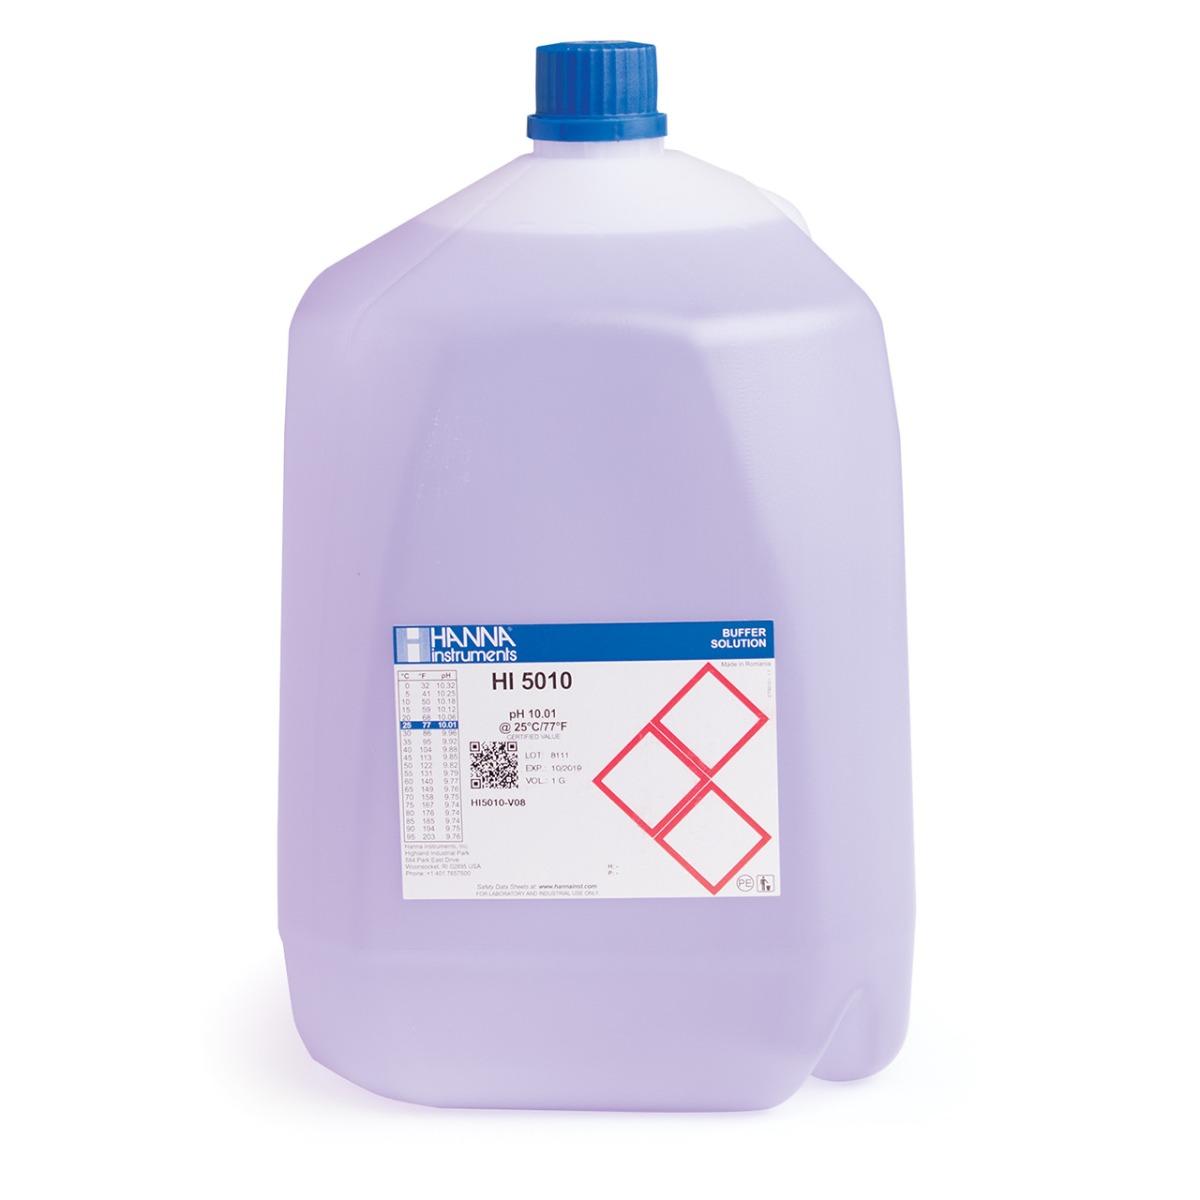 HI5010-V08 pH 10.01 Technical Calibration Buffer (1G (3.78L))